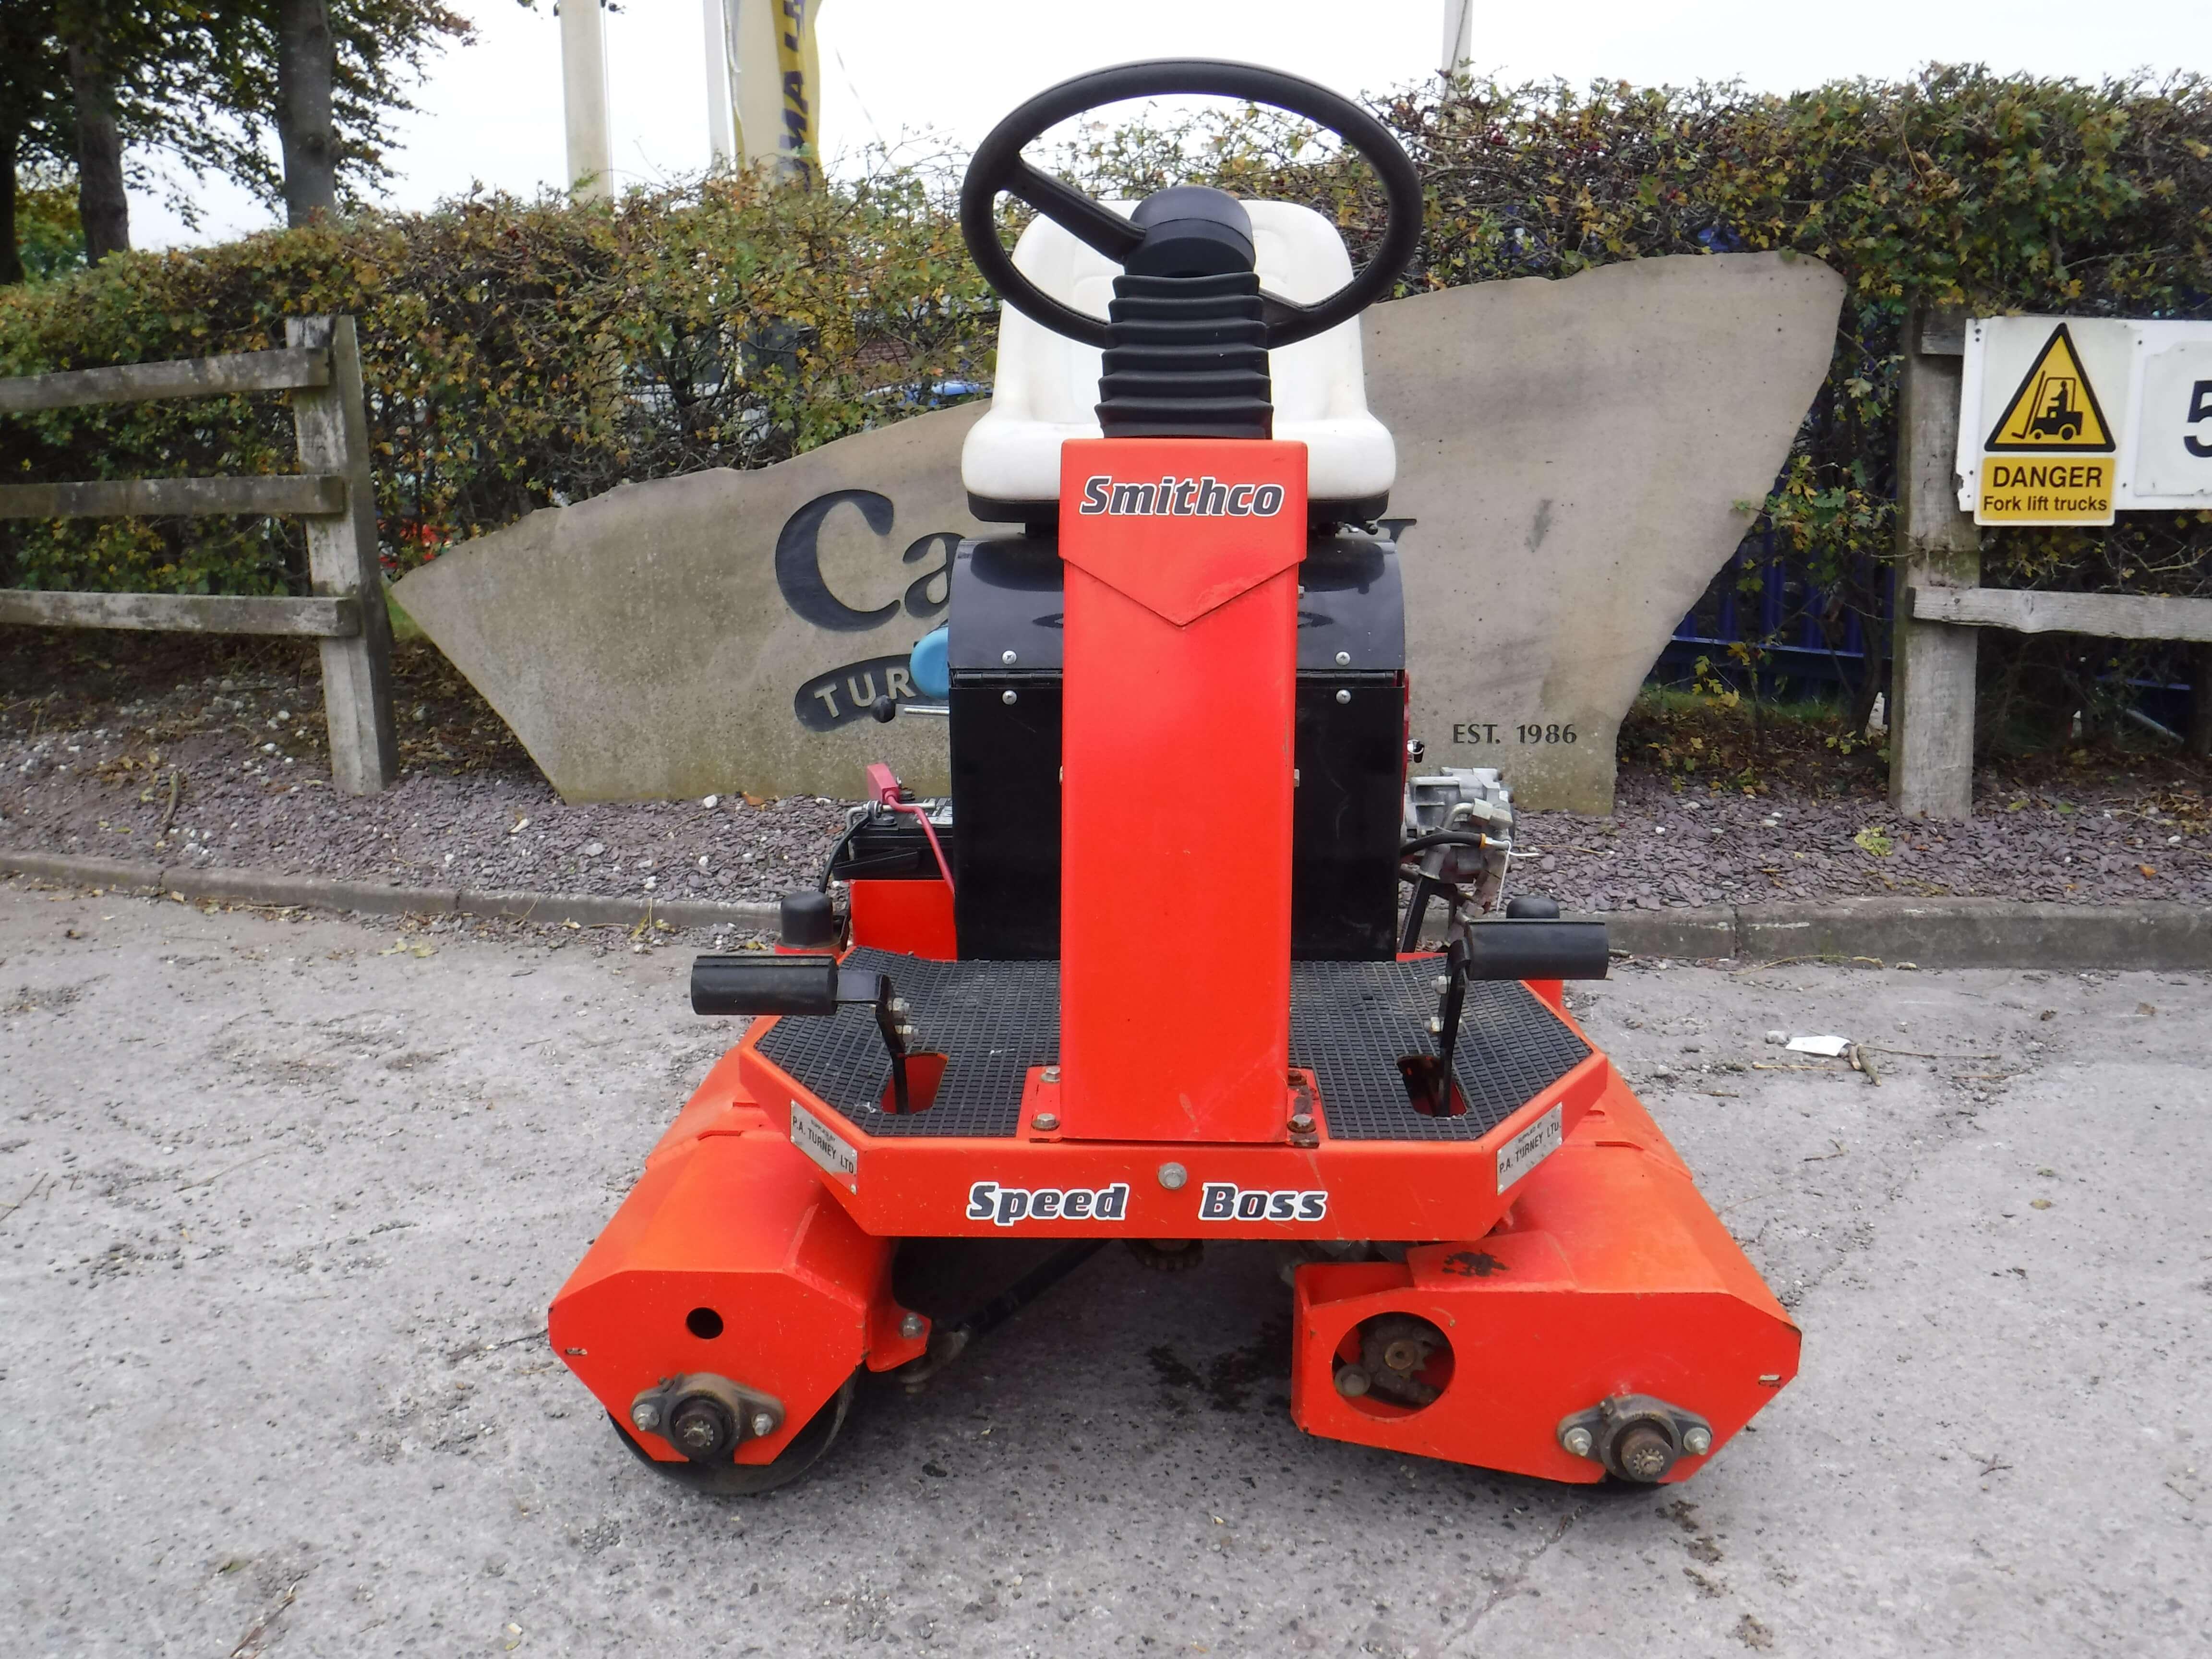 Smithco Speed Boss Roller - U4035